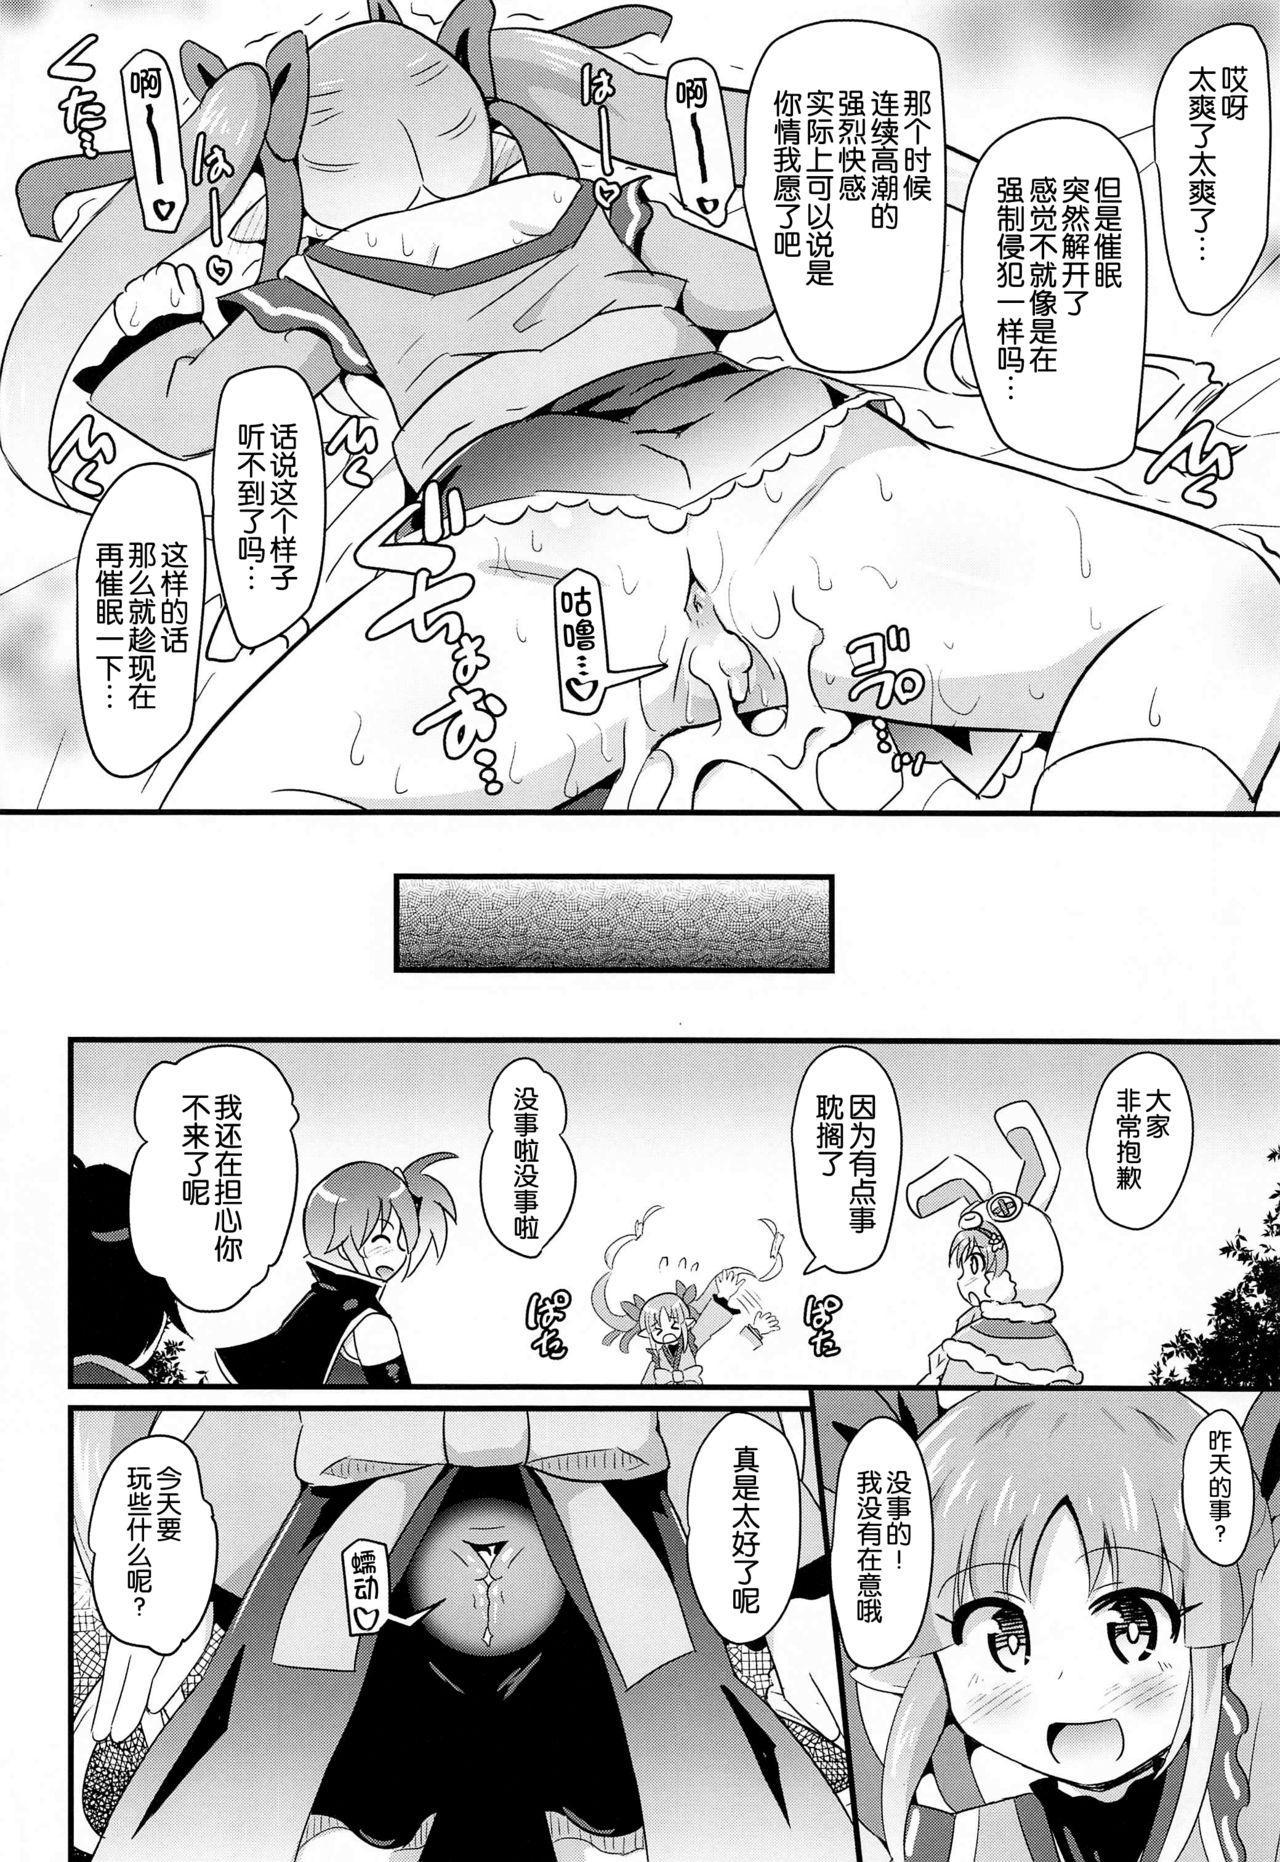 Kyouka-chan to Saimin Hentai Ecchi!! 23